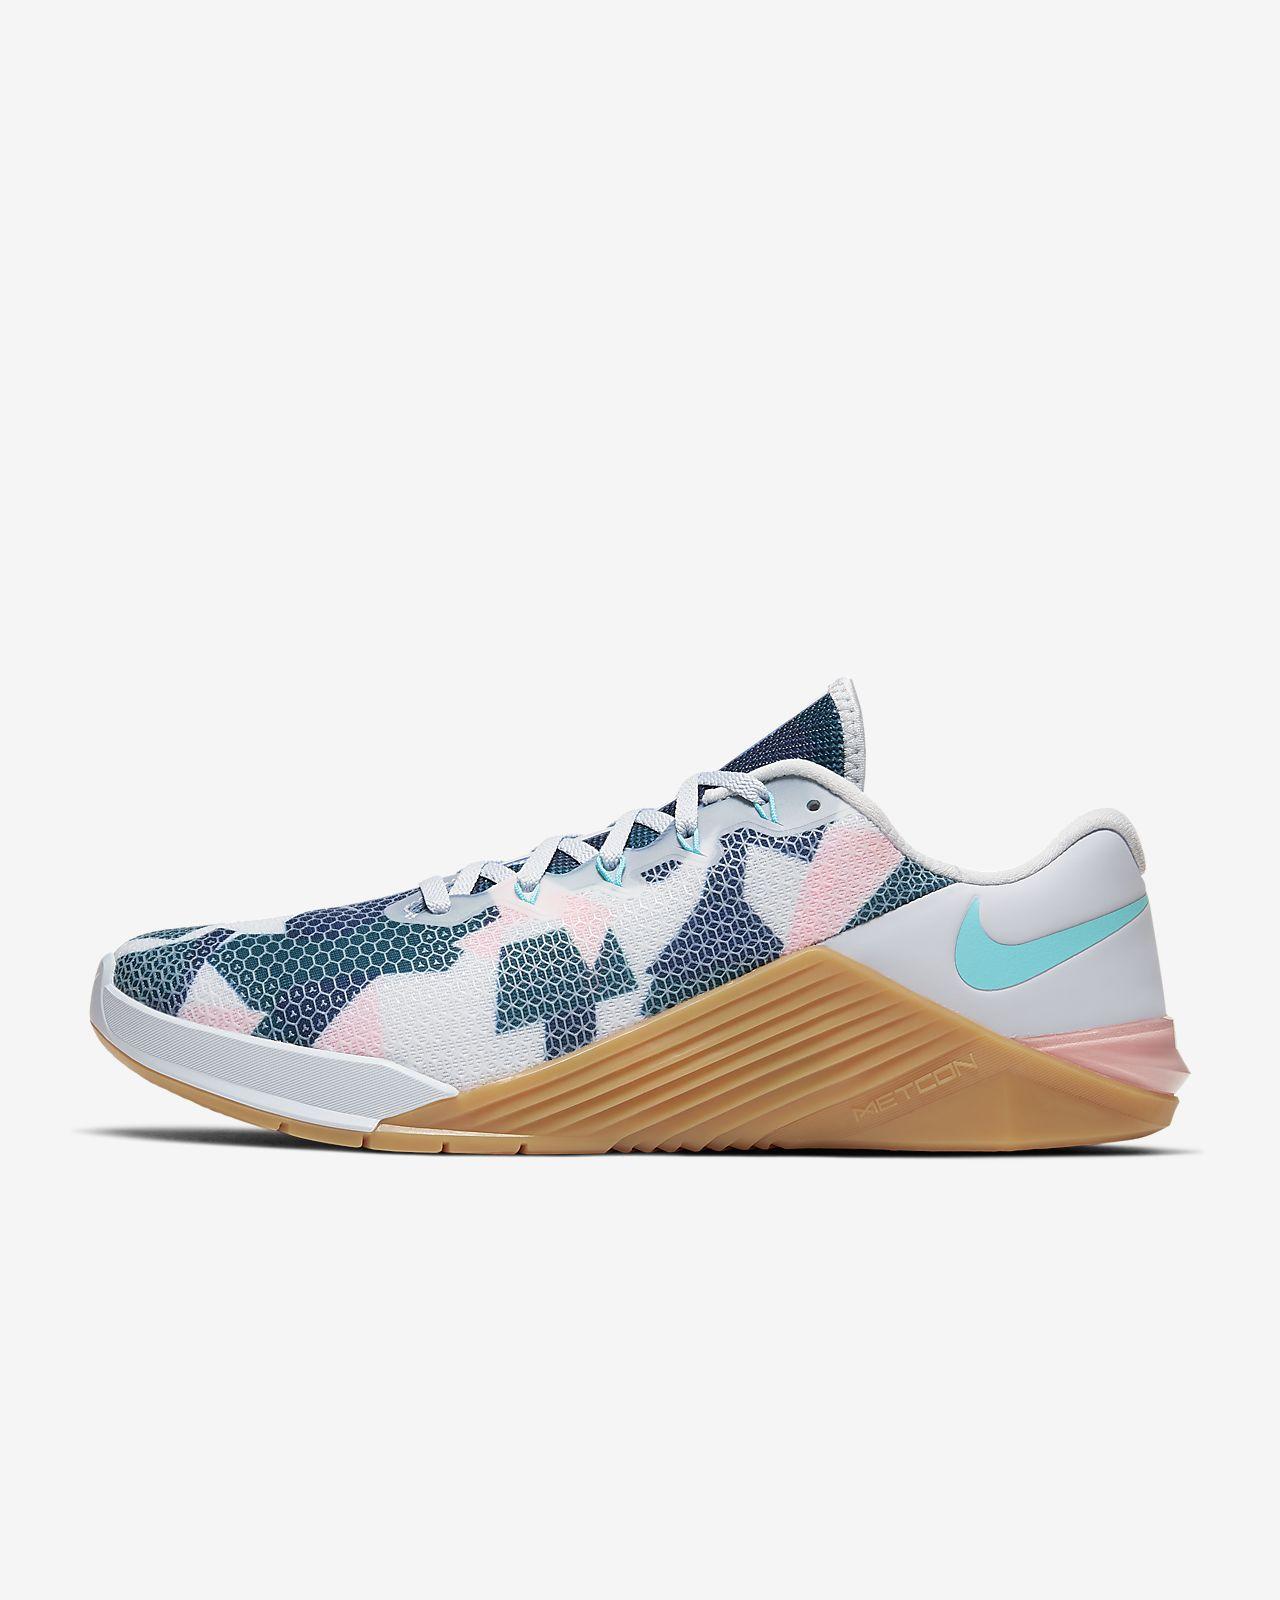 Nike Metcon 5 Training Shoe